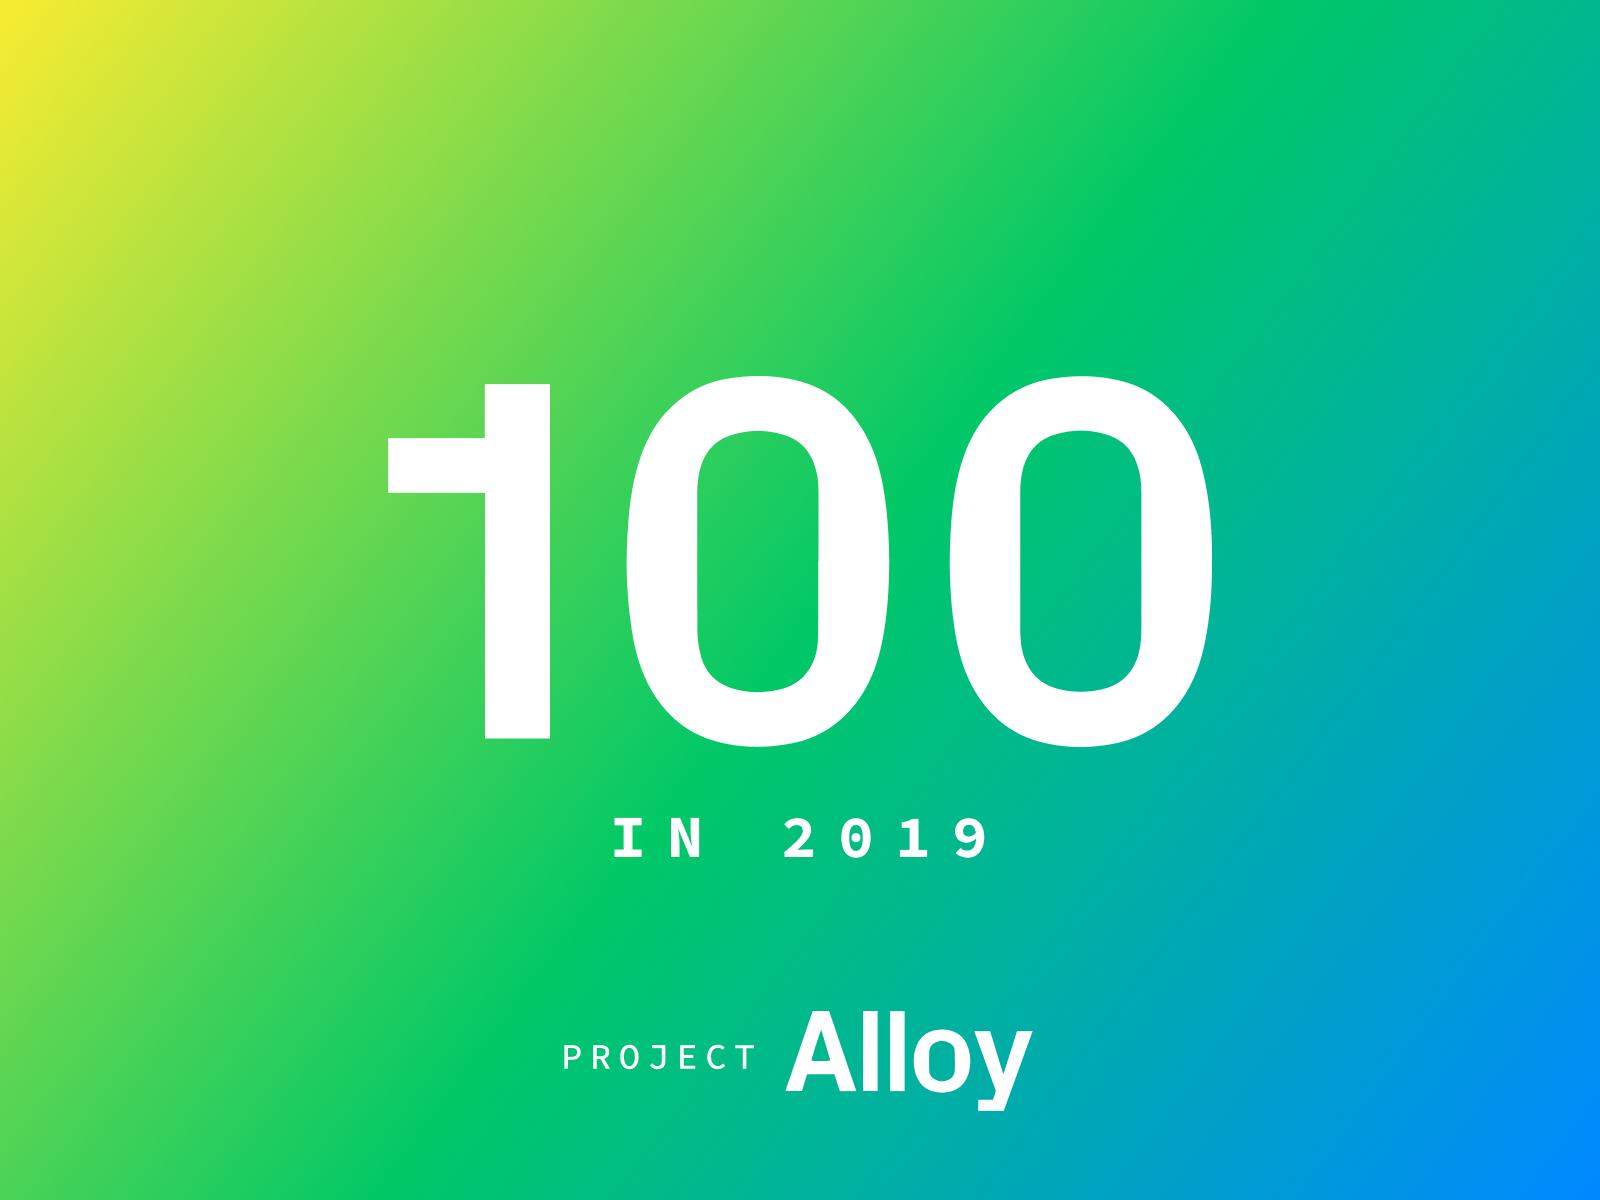 100 2019